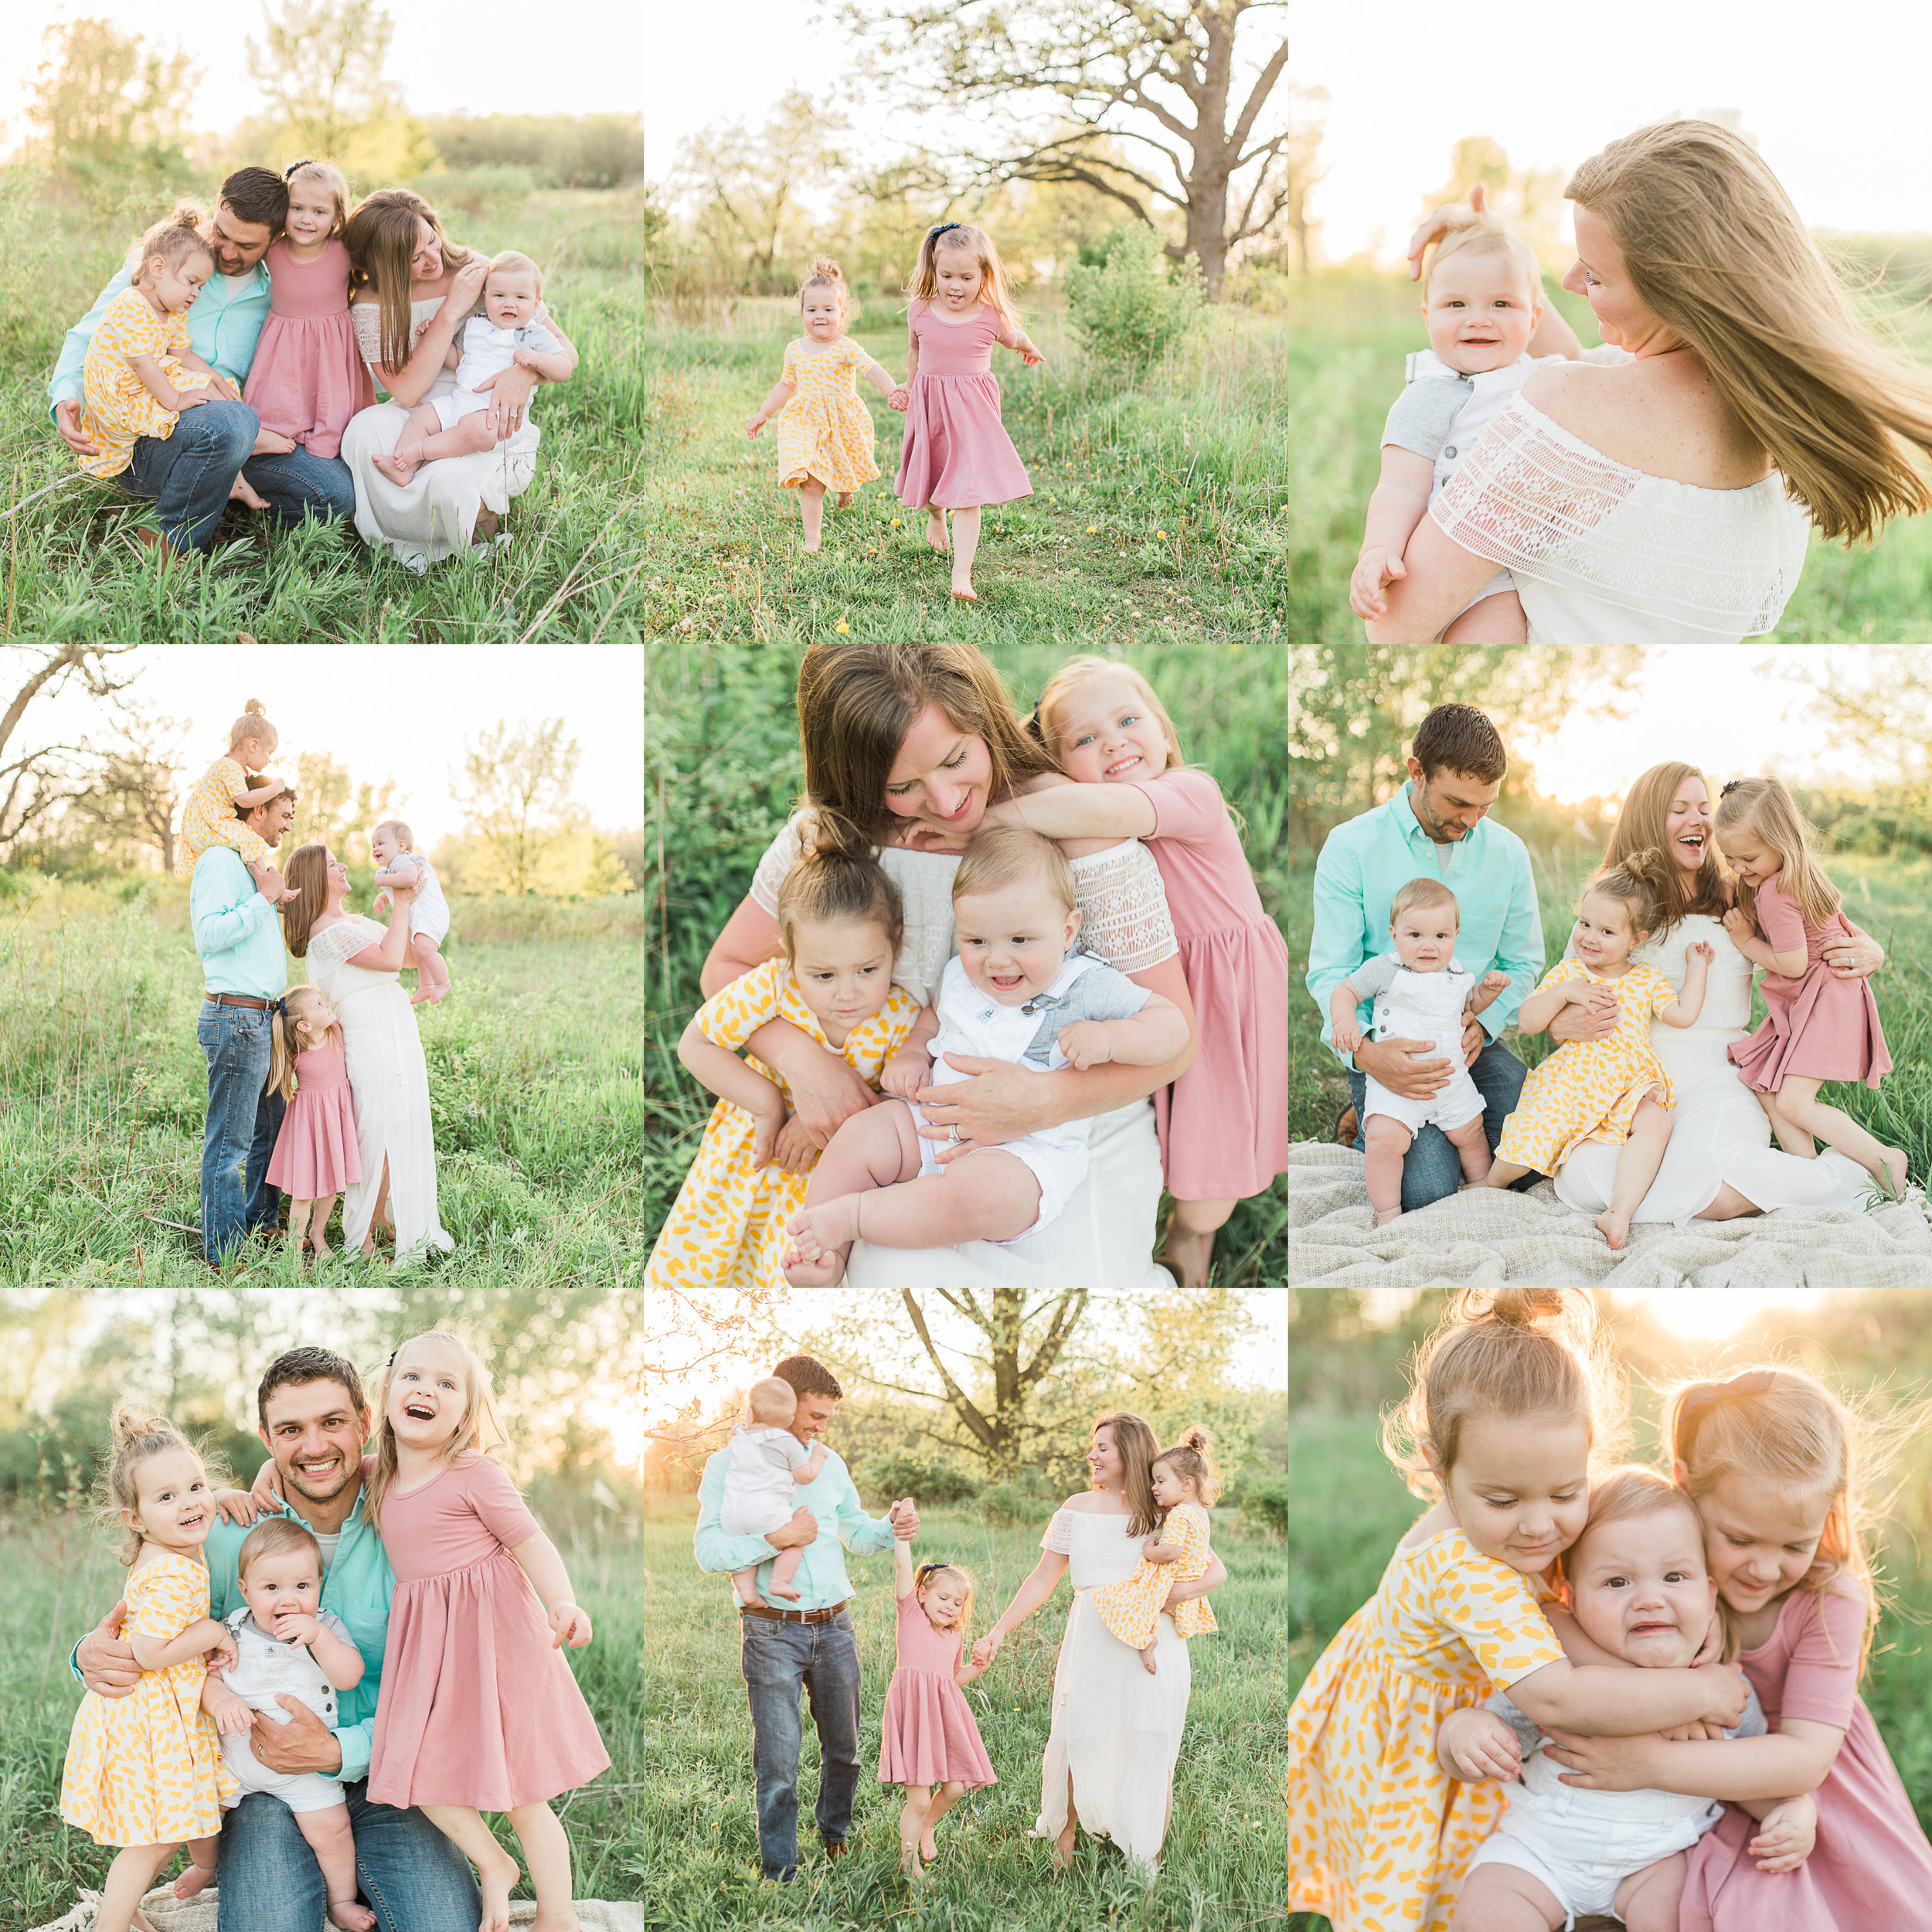 vanessa wyler photography brookfield wisconsin family photography sunset fox brook park